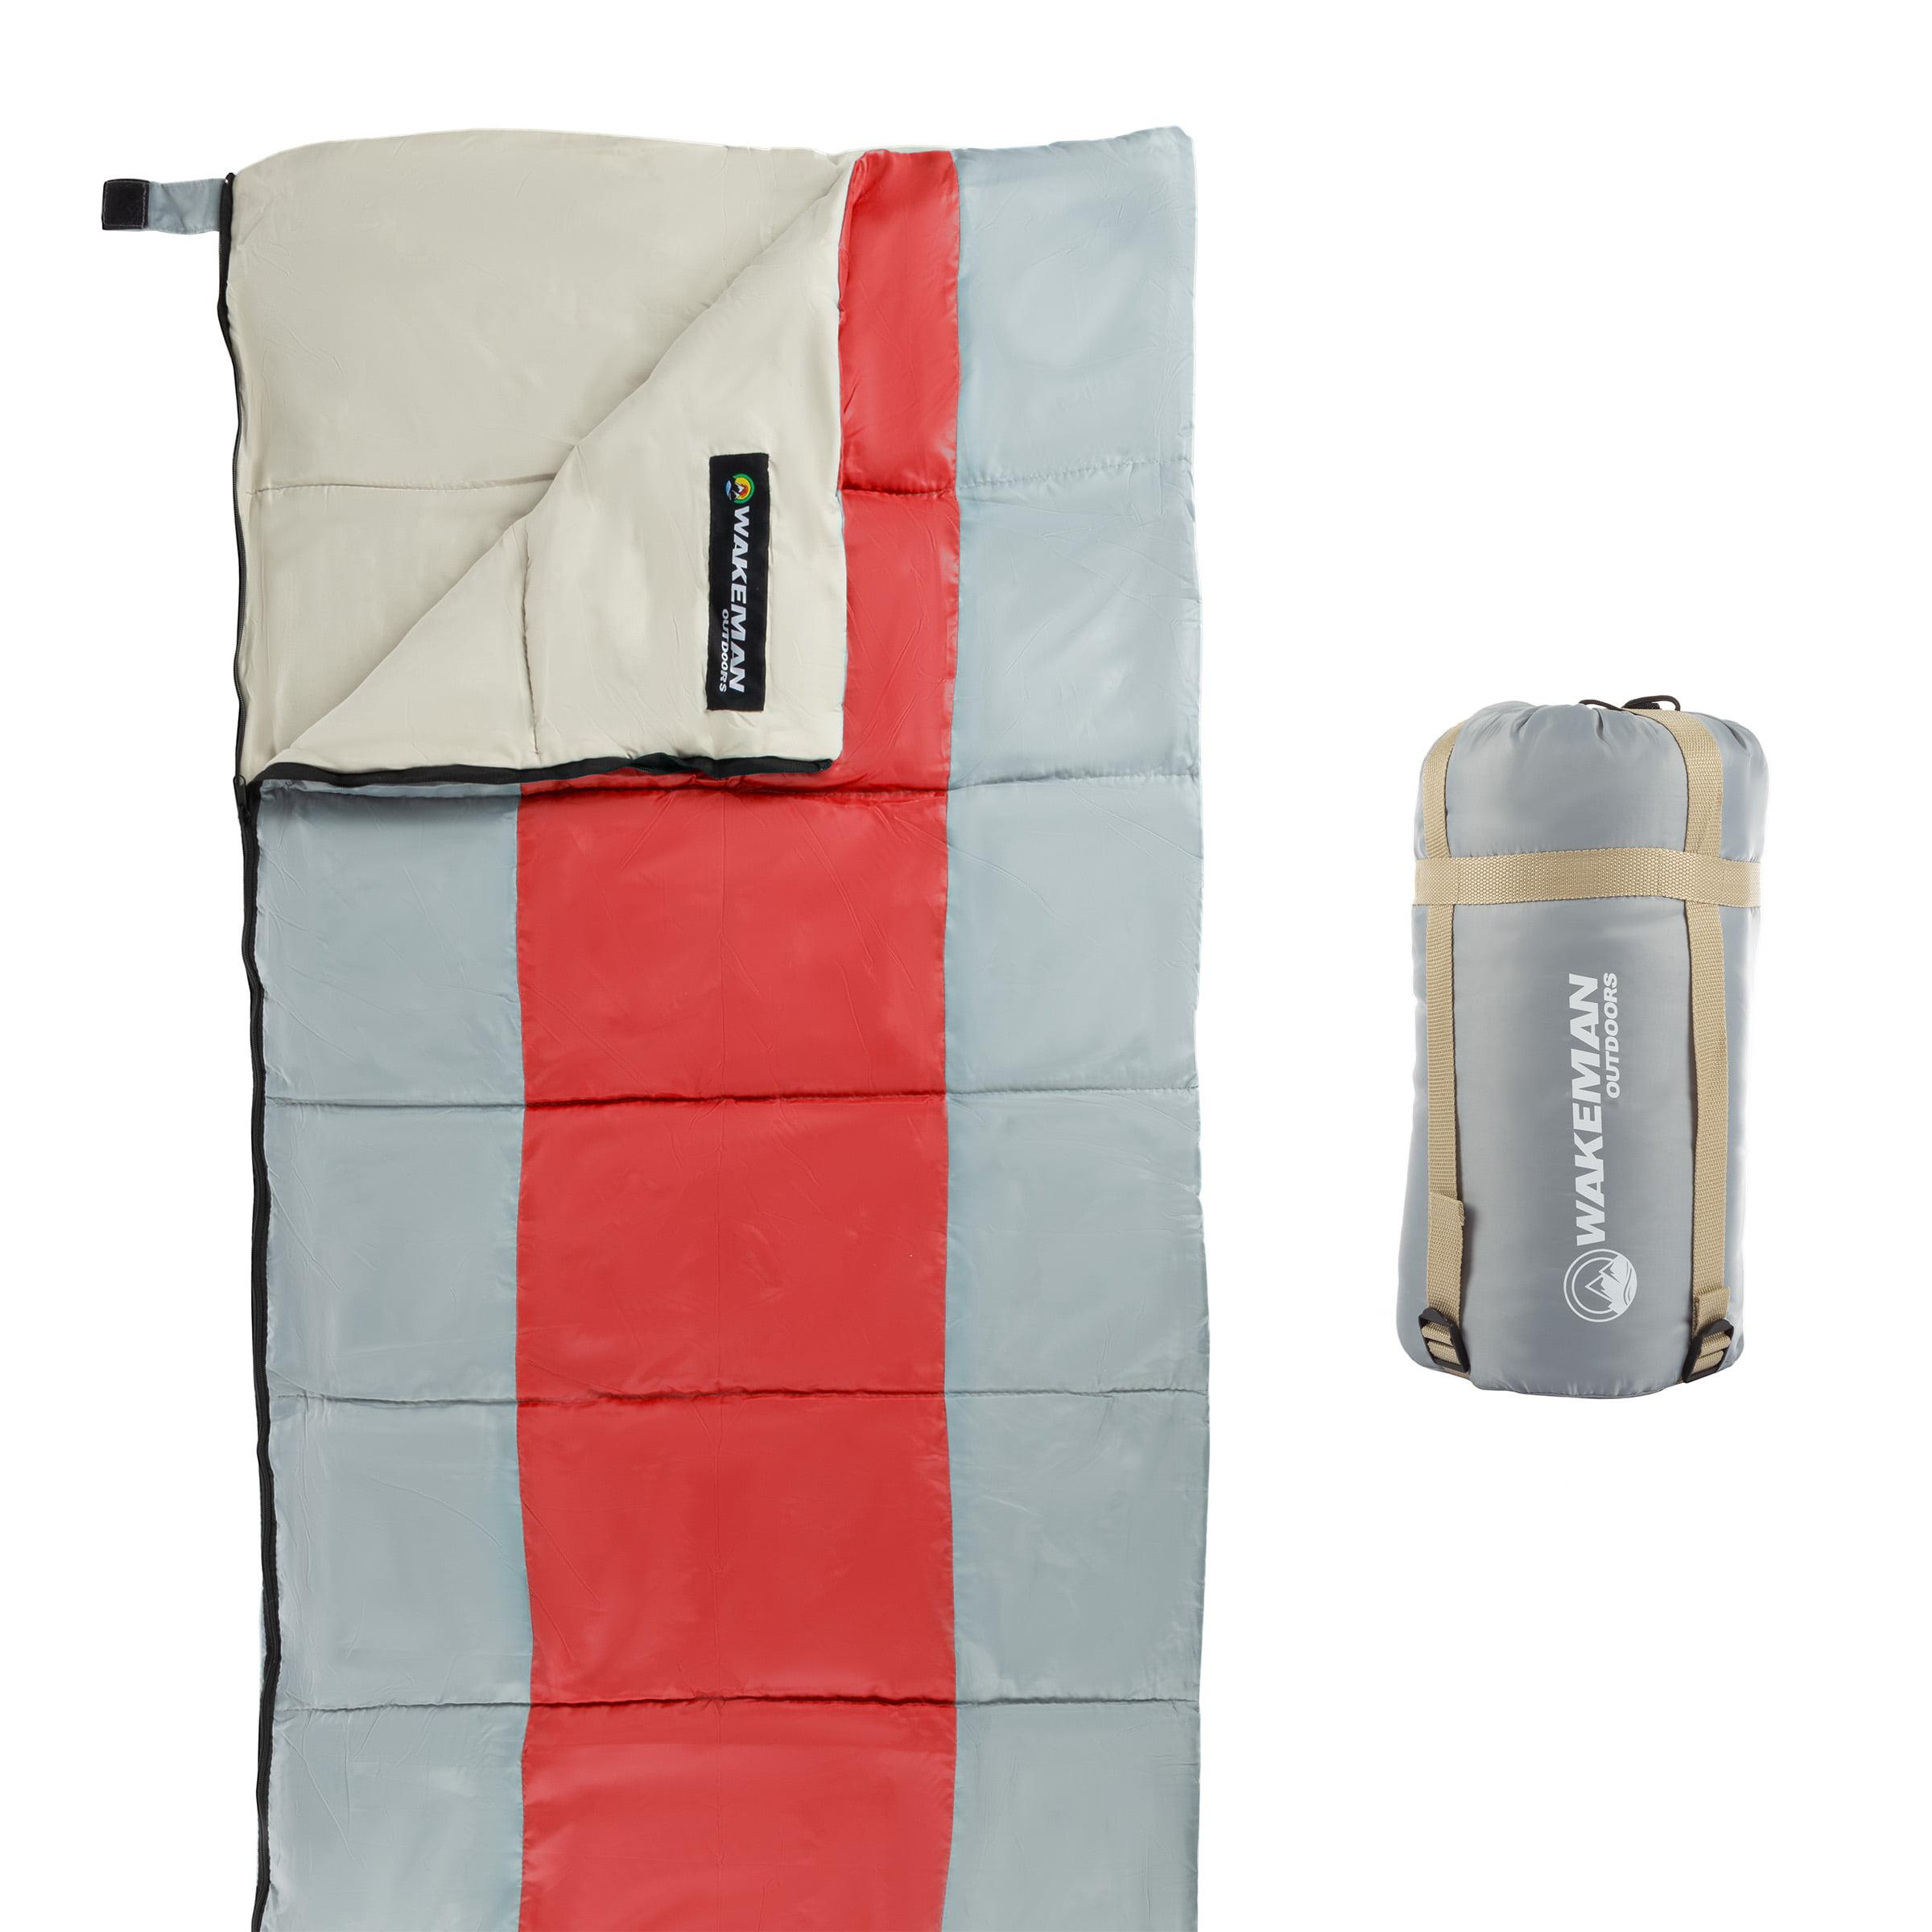 5ive Star Gear Emergency Sleeping Bag